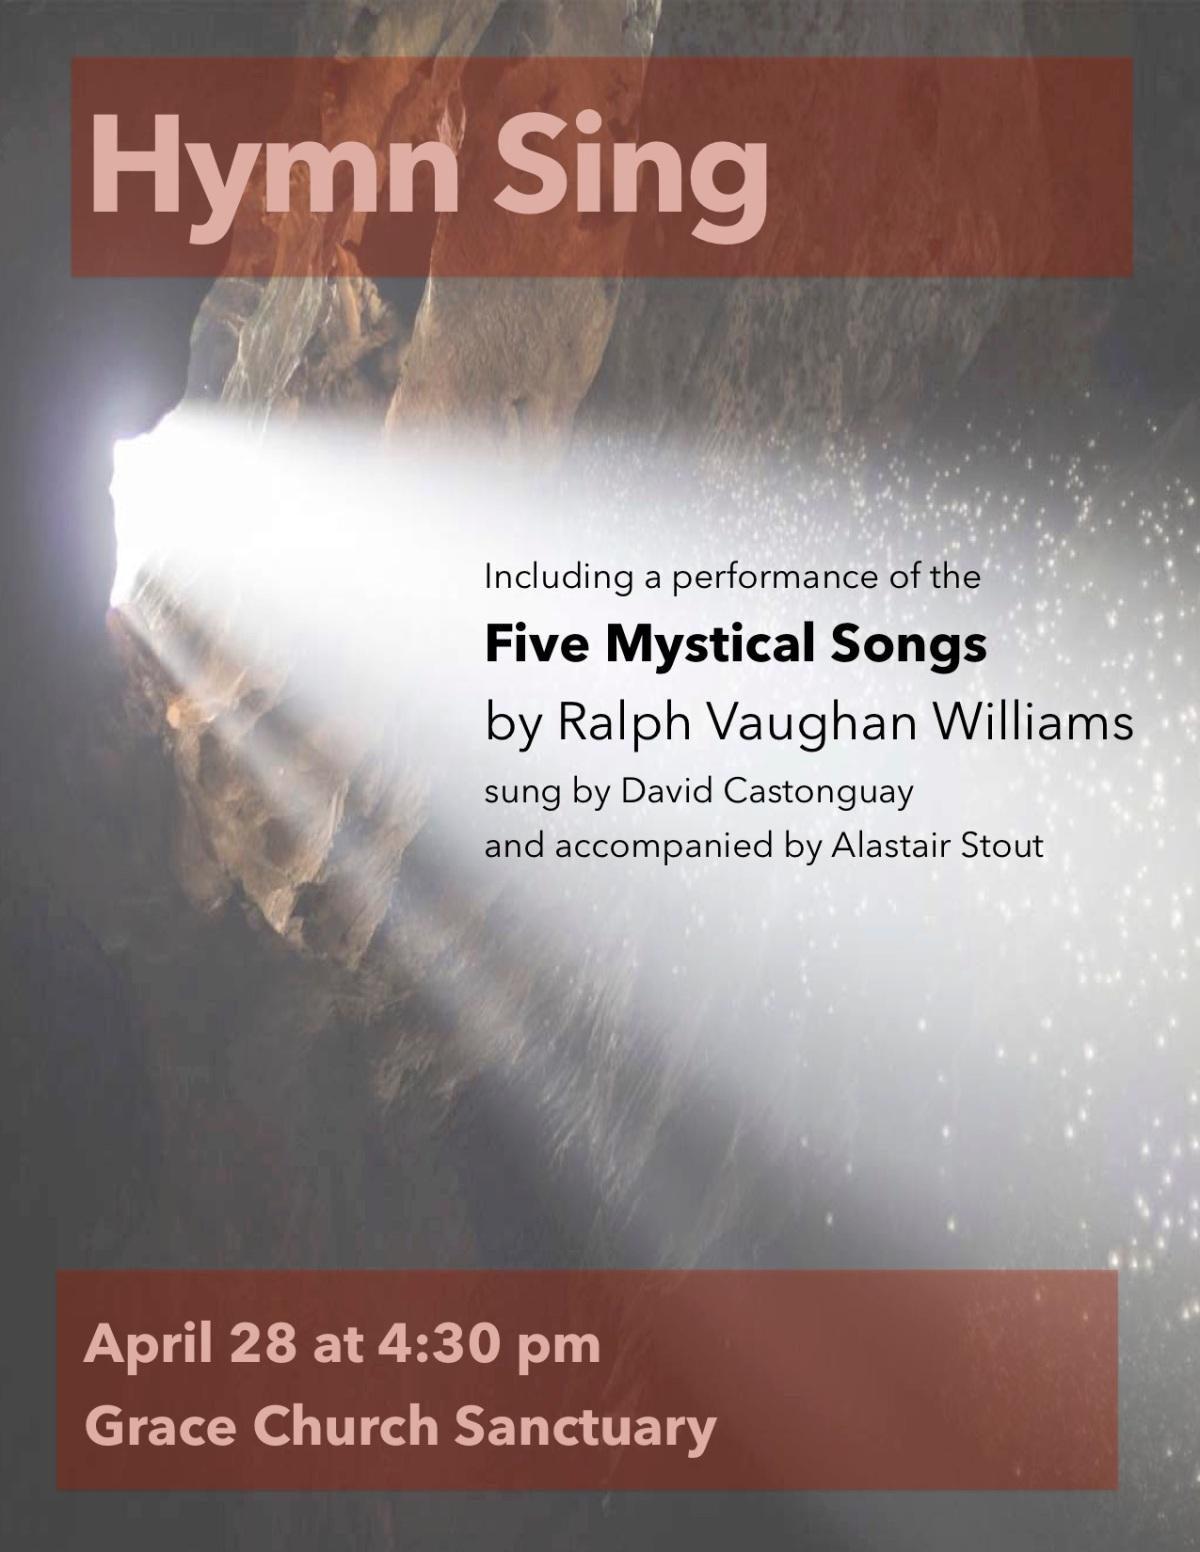 Apr. 28 ~ Spring HymnSing